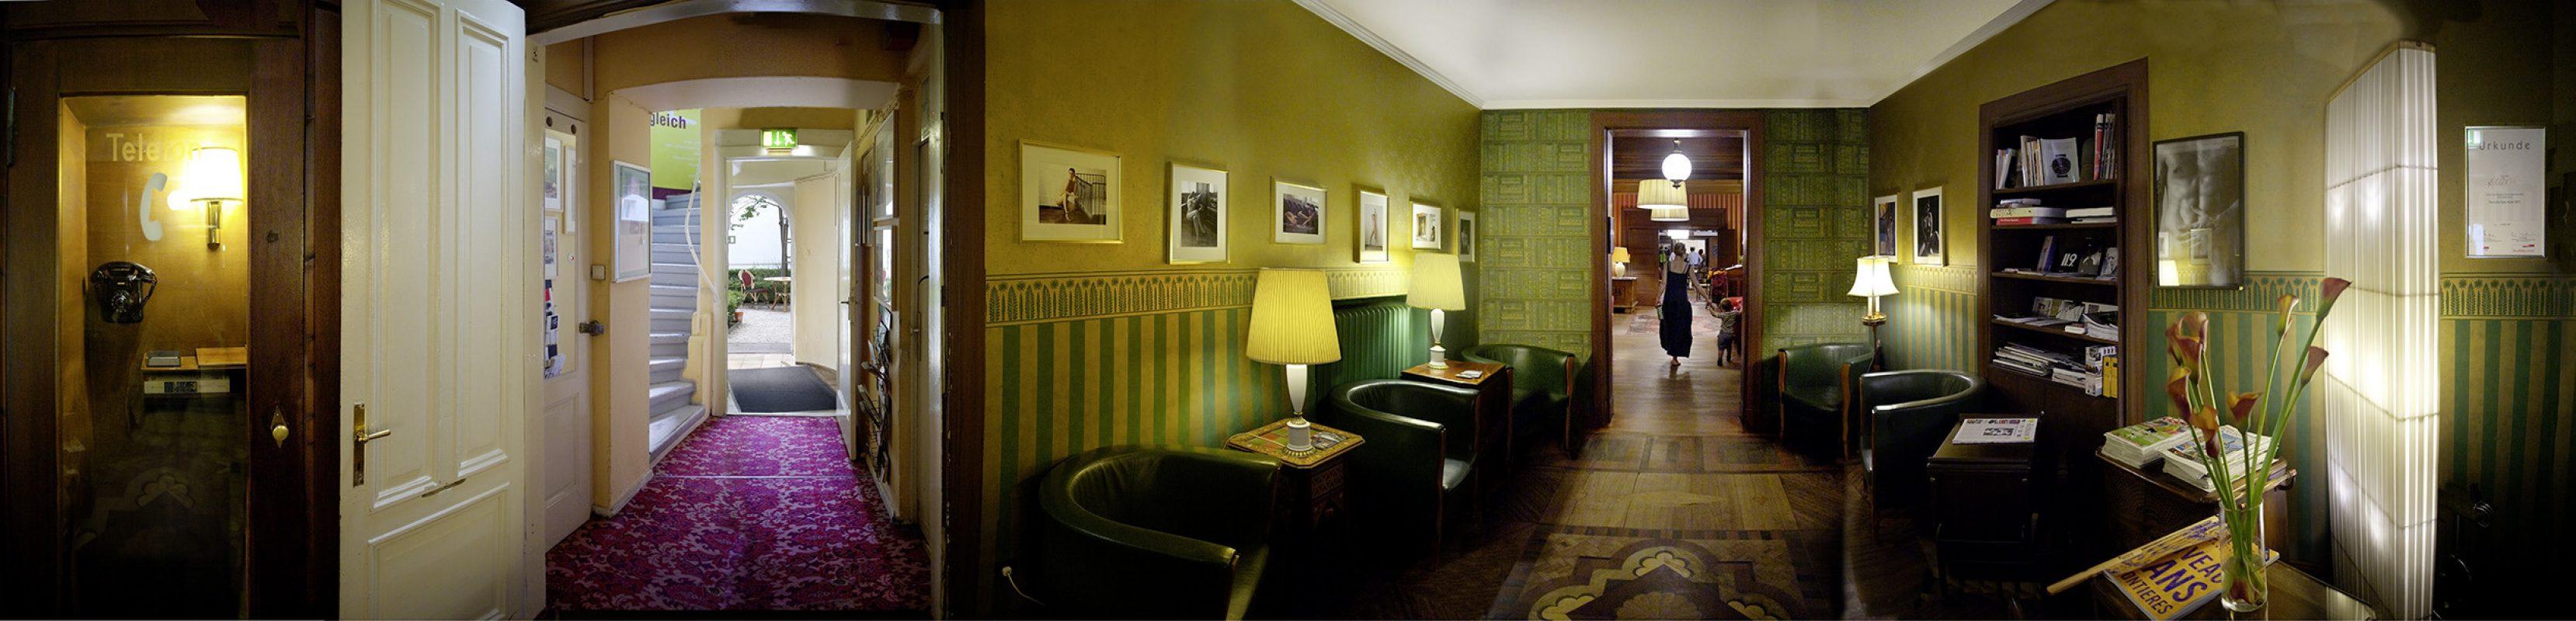 Hotel Bogota Bibliothek